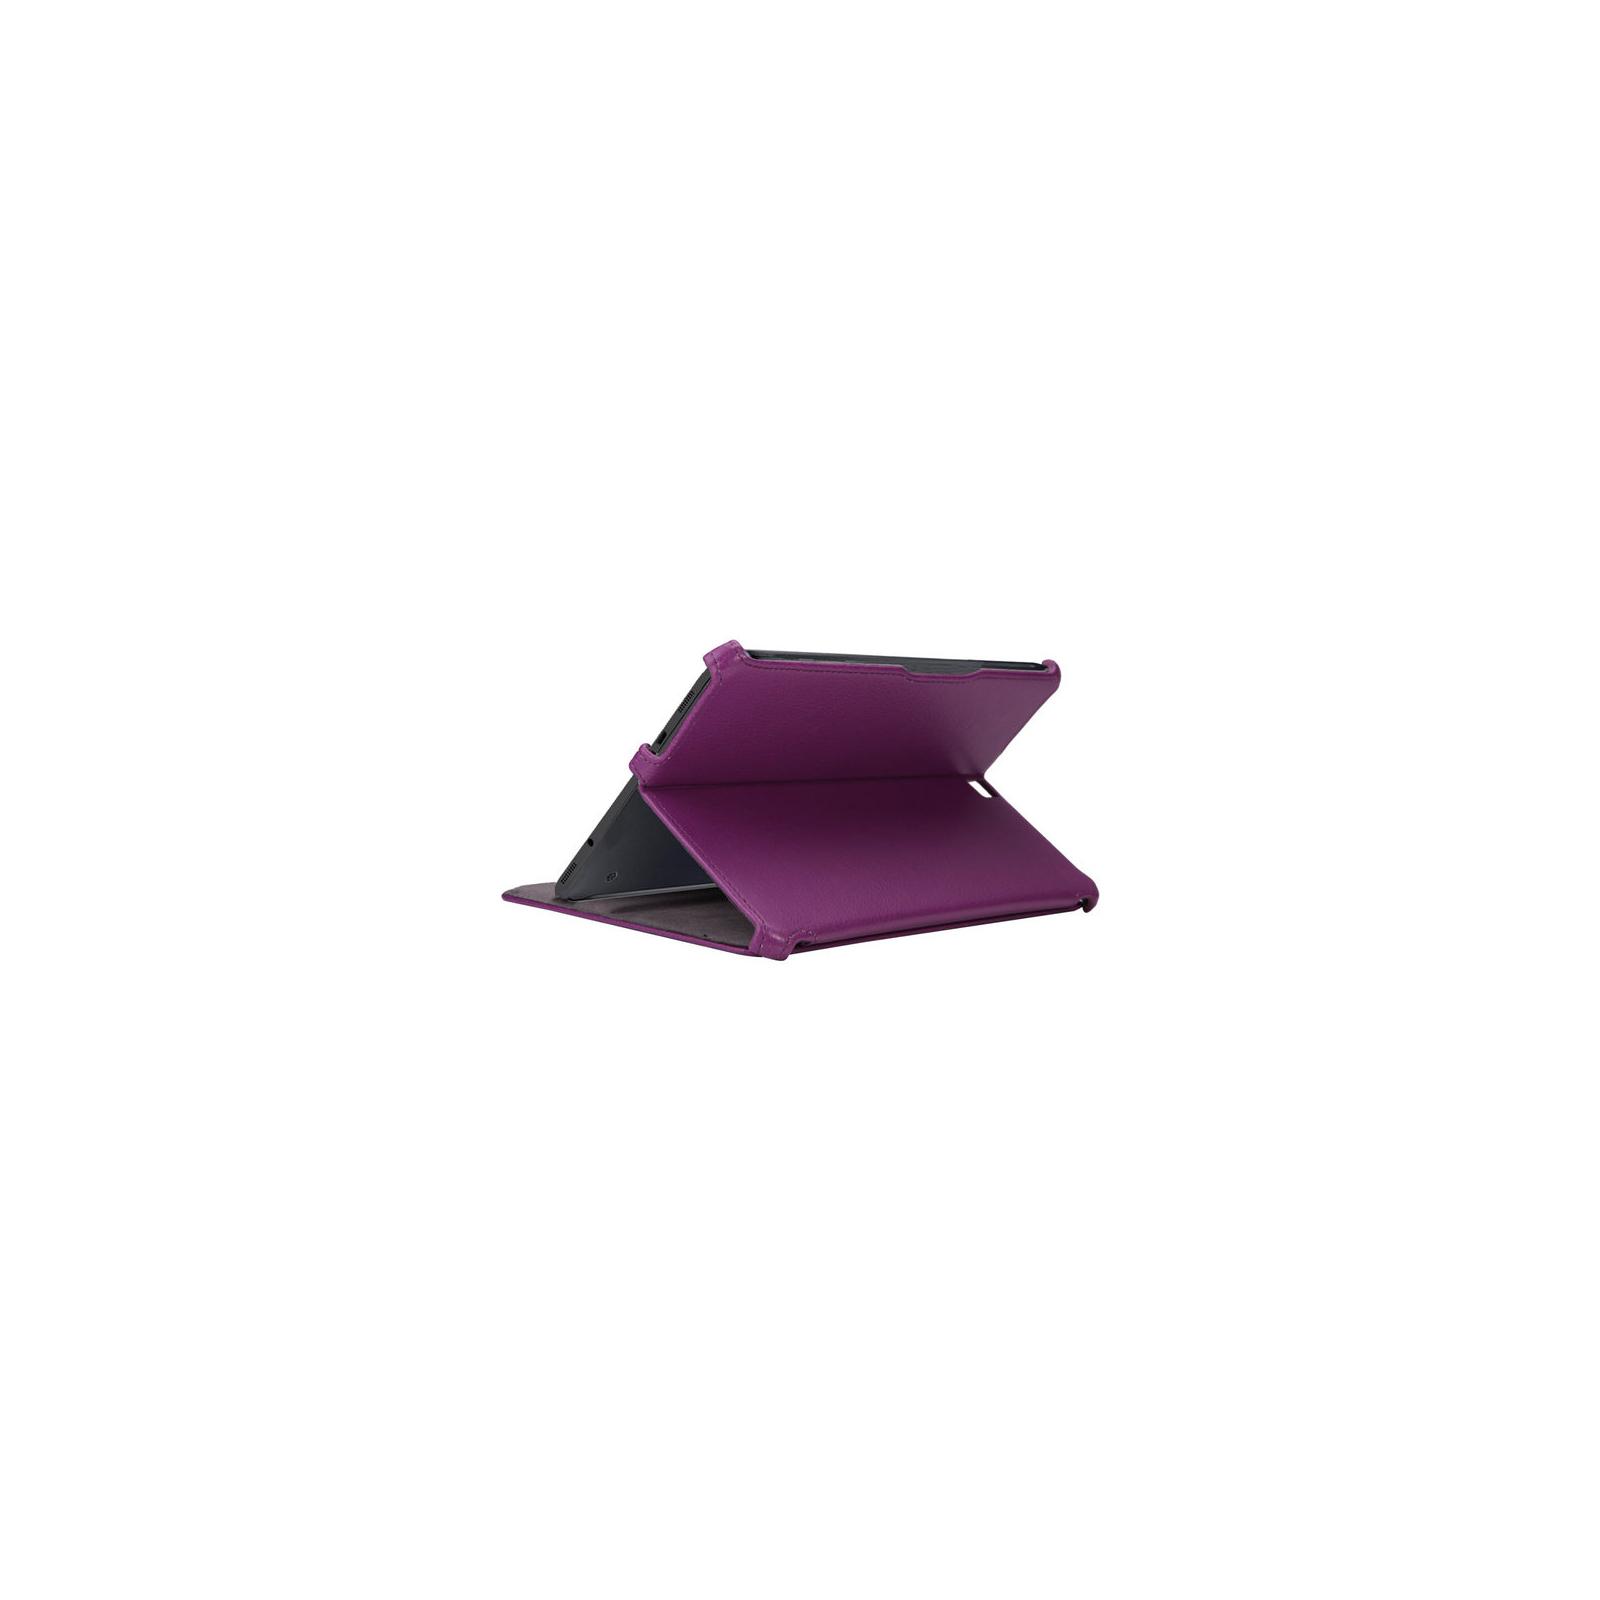 Чехол для планшета AirOn для Samsung Galaxy Tab S 2 9.7 viol (4822352777852) изображение 7